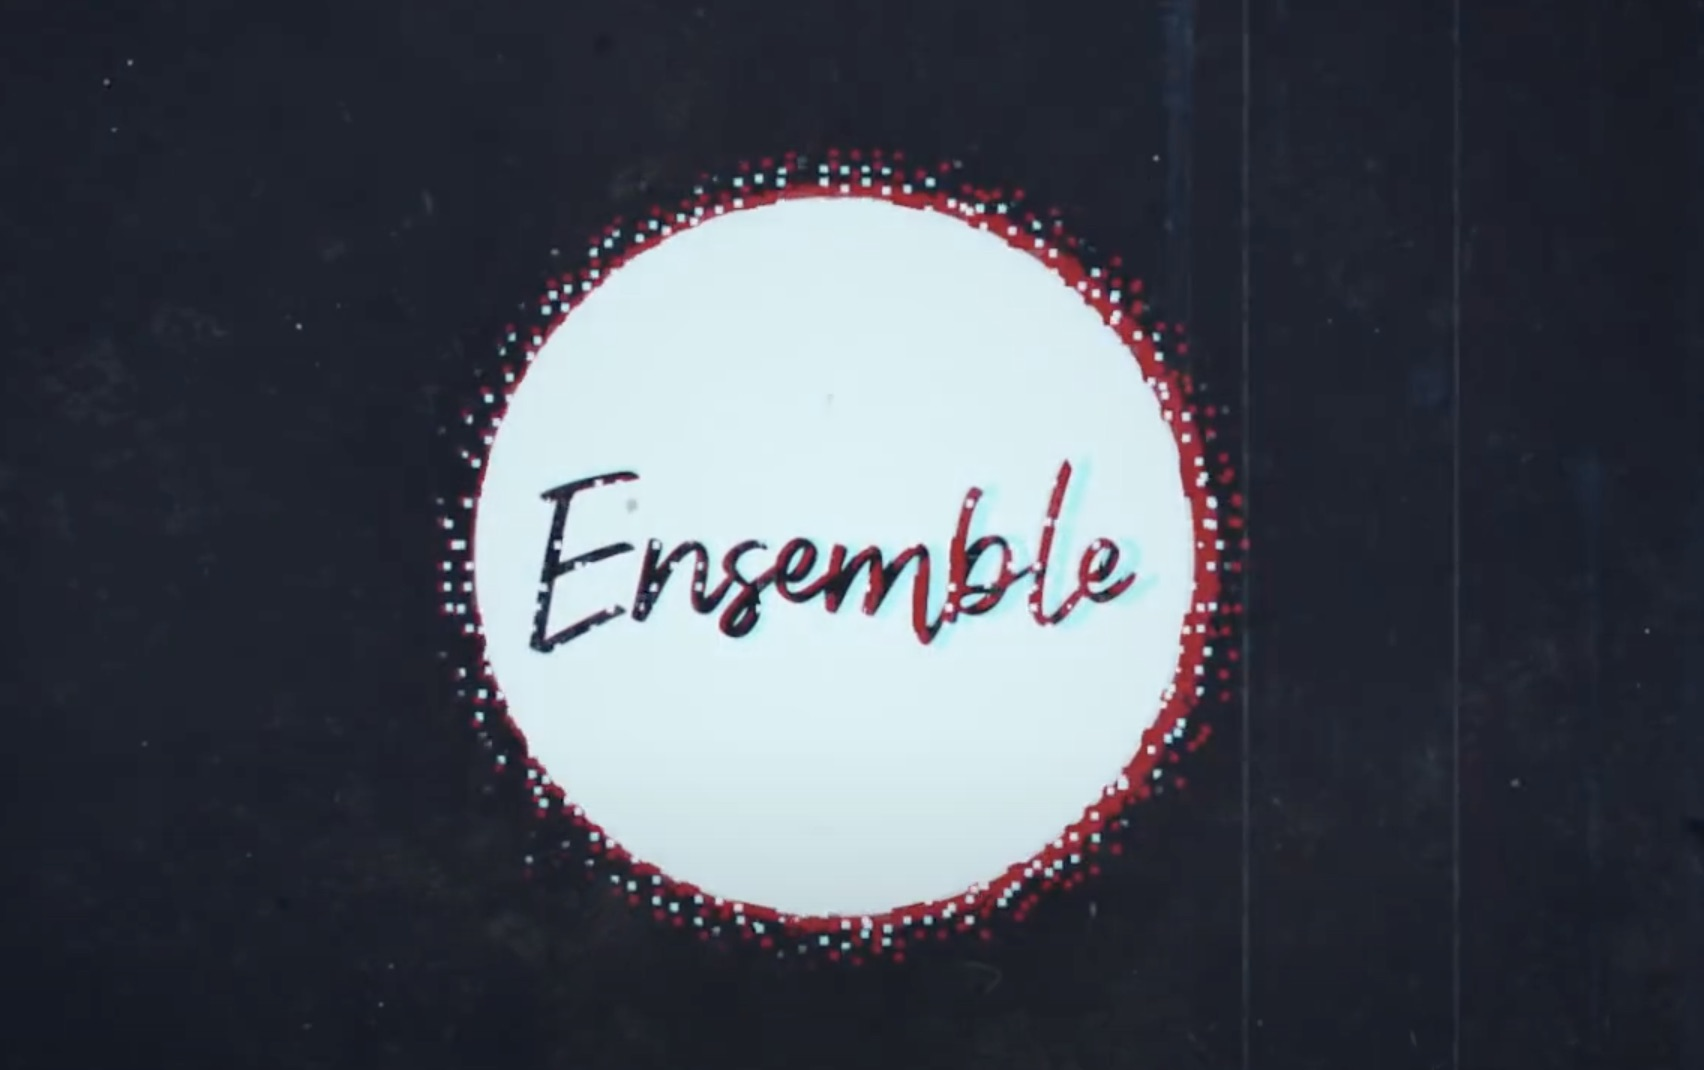 Les Frangines - Ensemble - clip participatif